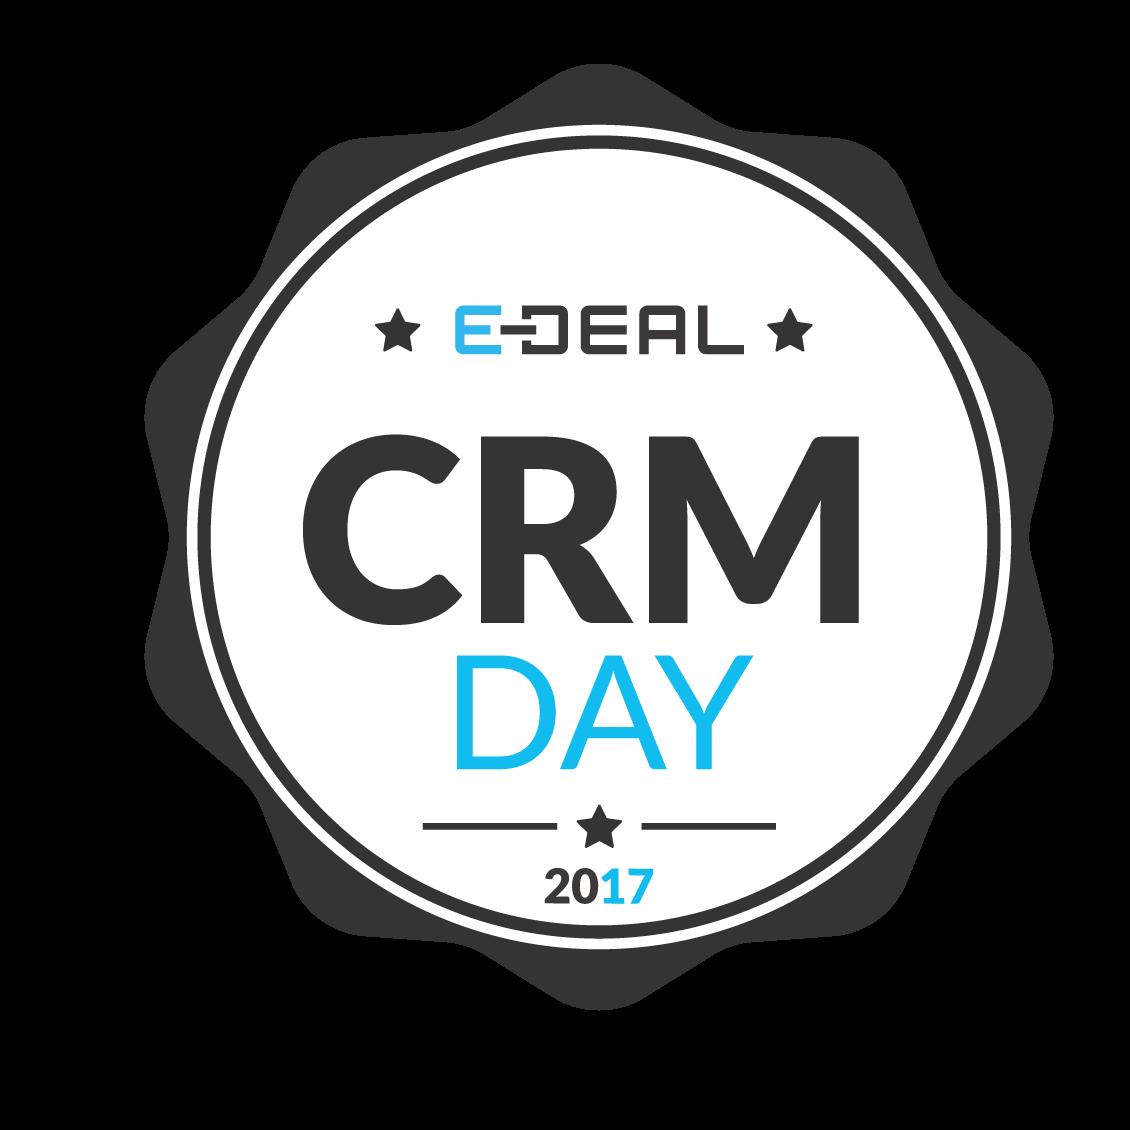 Le concept du E-DEAL CRM Day